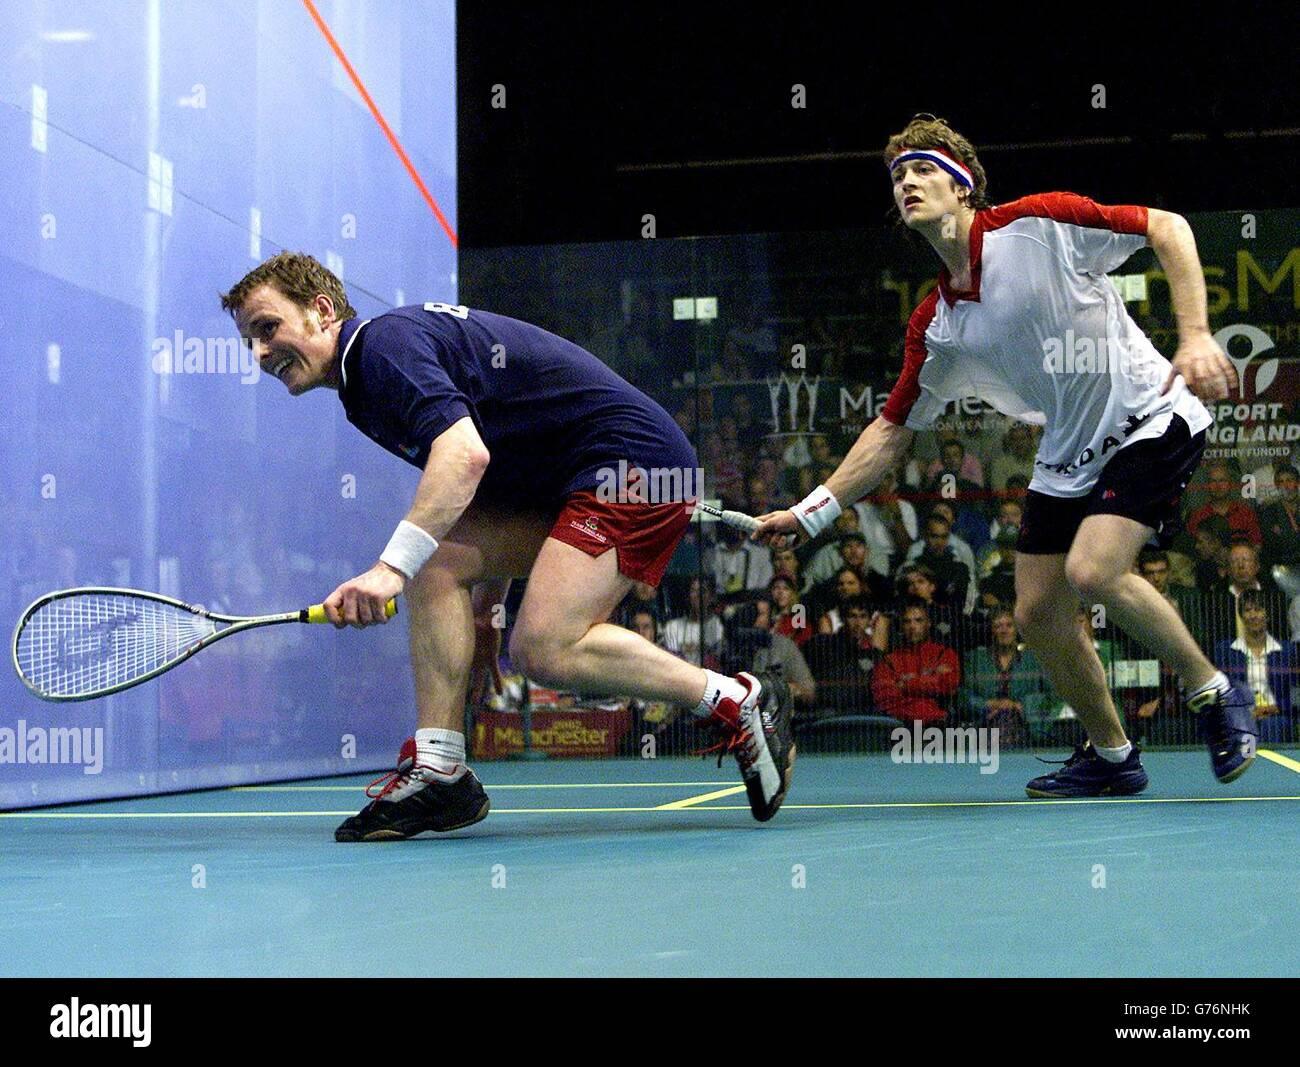 Mens Squash Singles final - England's Peter Nicol (left) - Stock Image